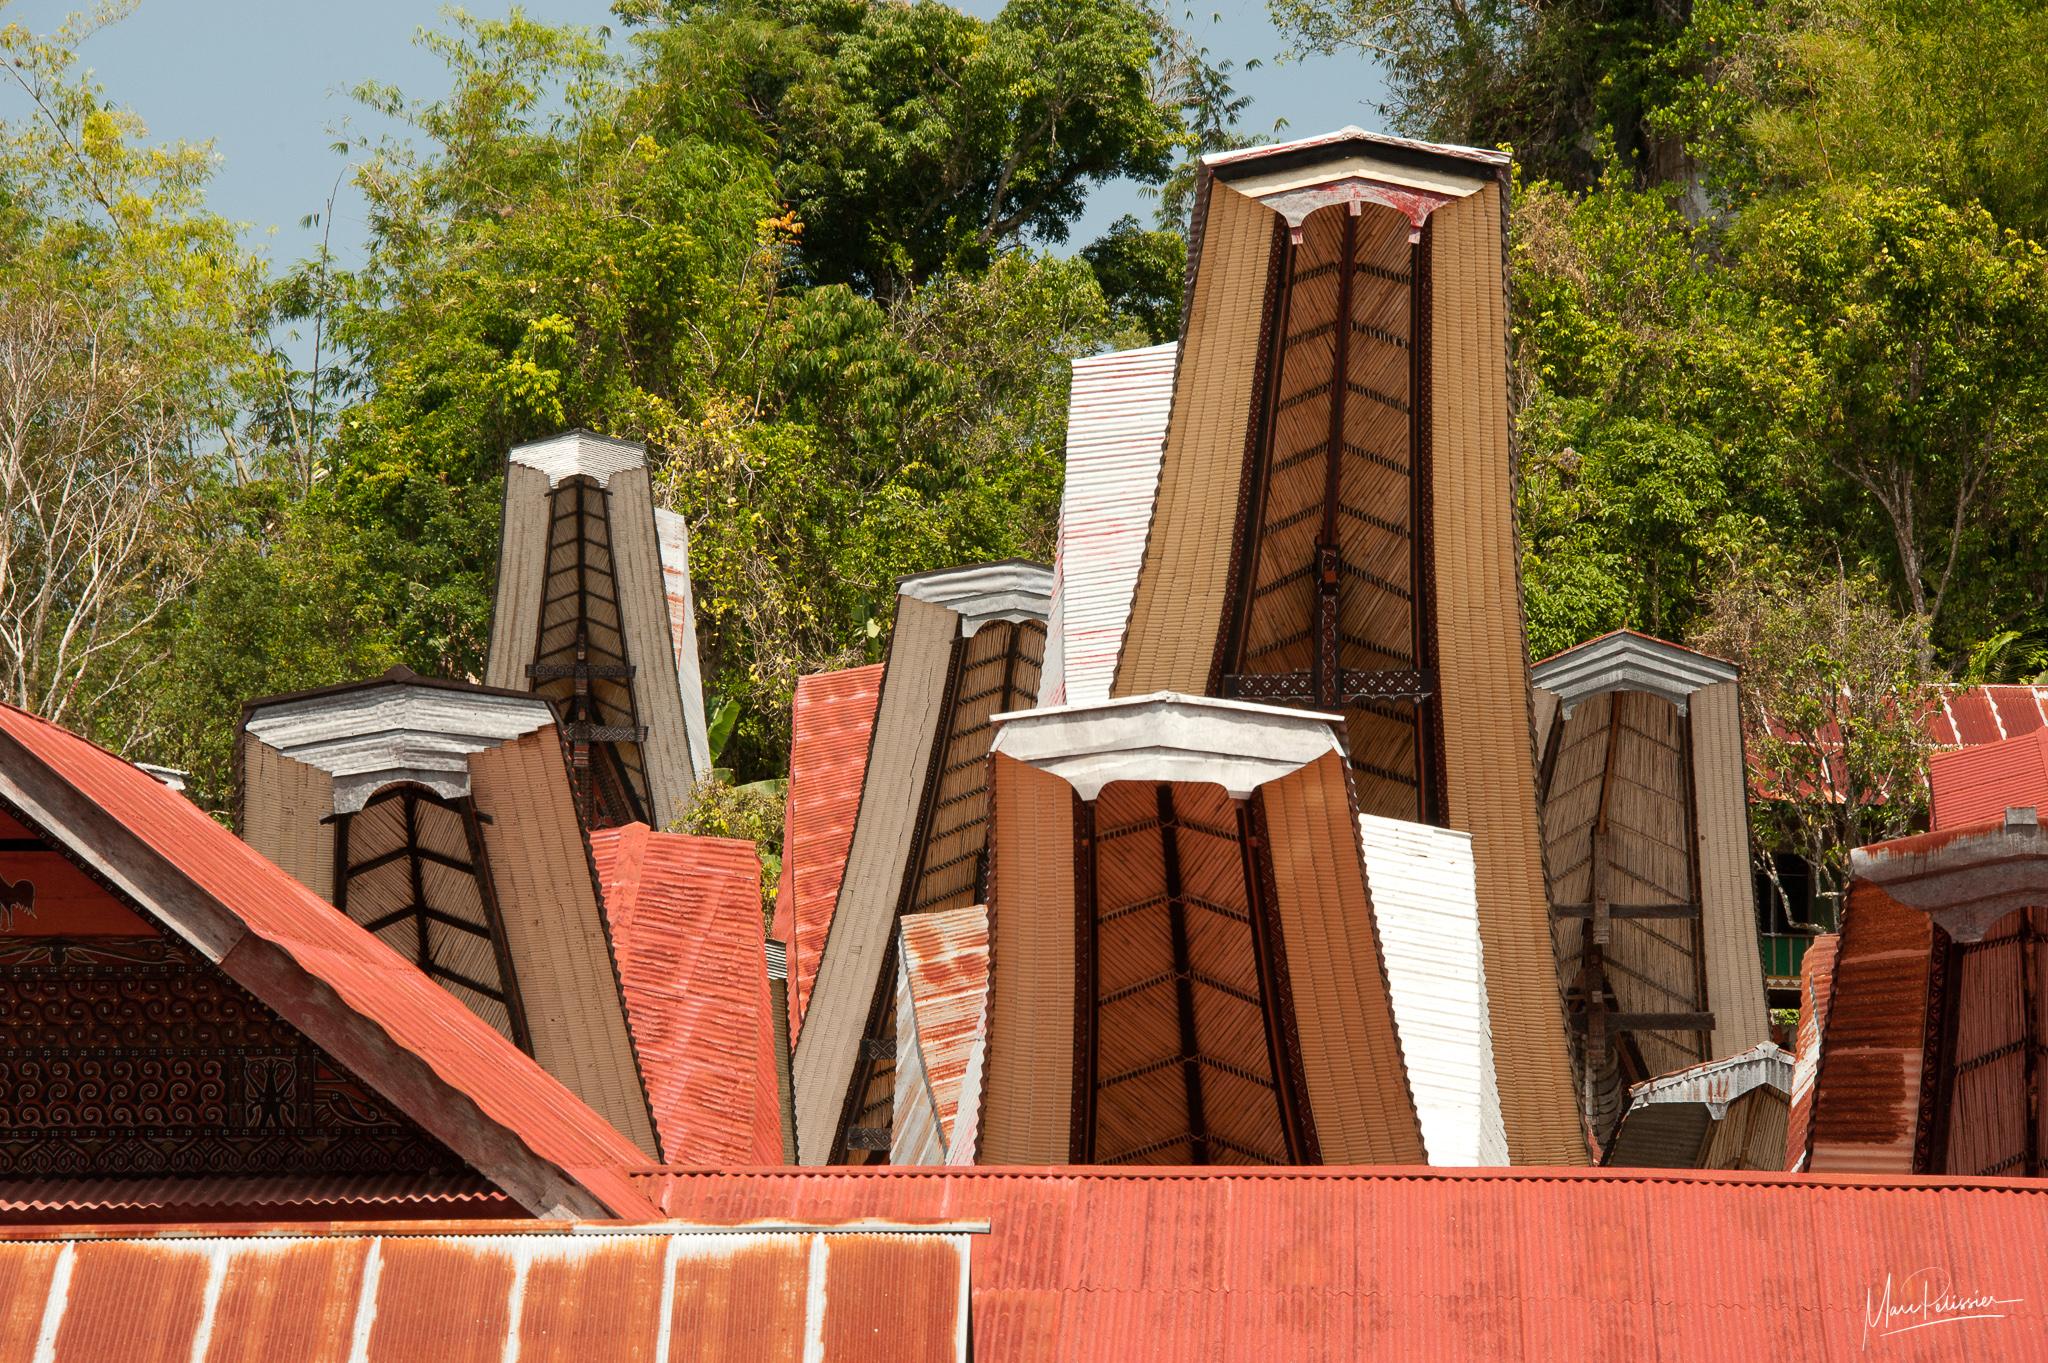 Toraja roof, Indonesia